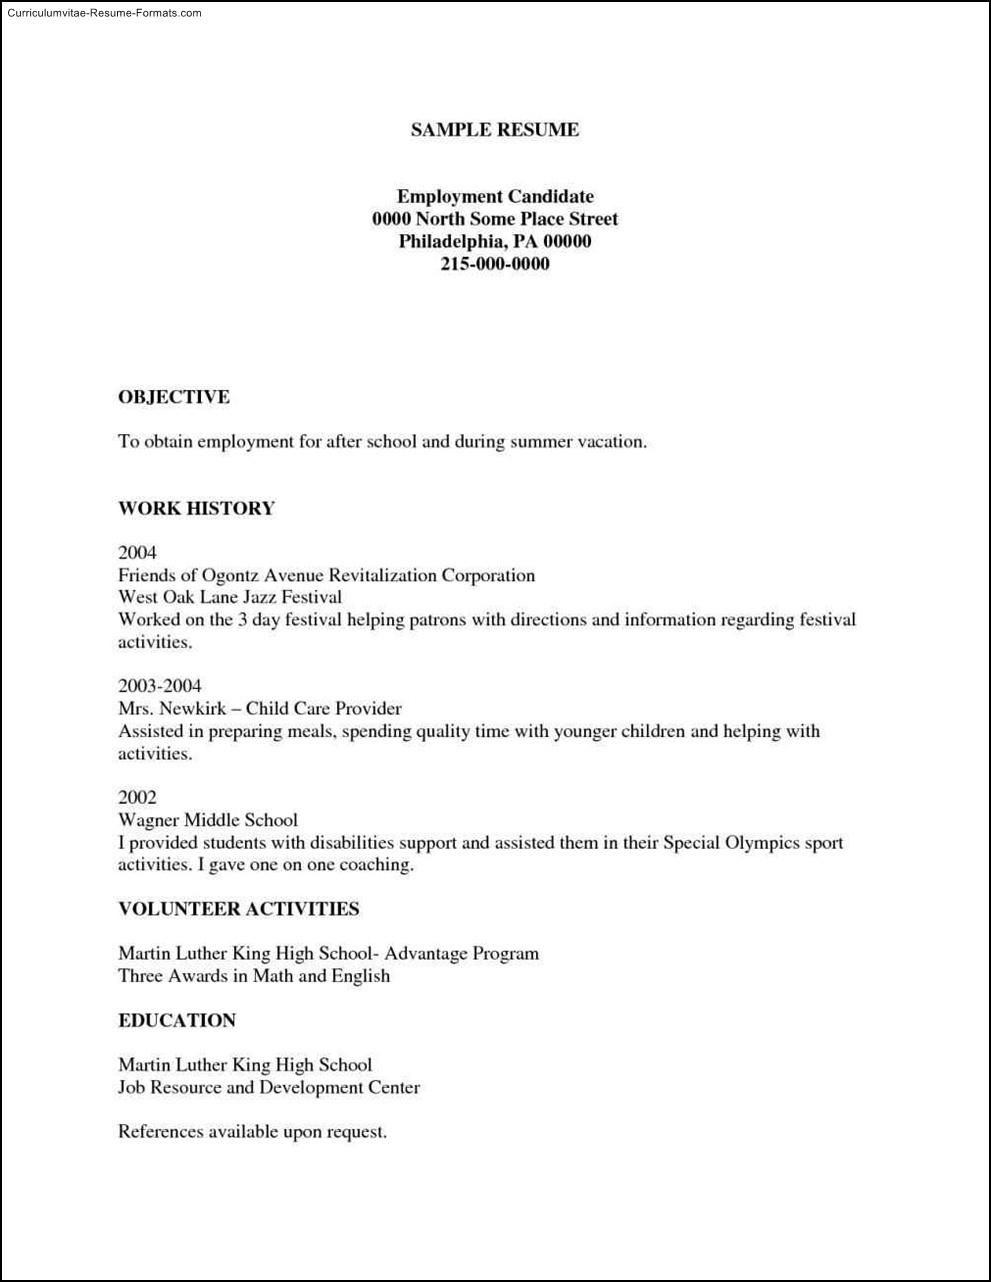 Word Resume Template 30 Awesome Printable Resume Examples Resumes - Free Printable Resume